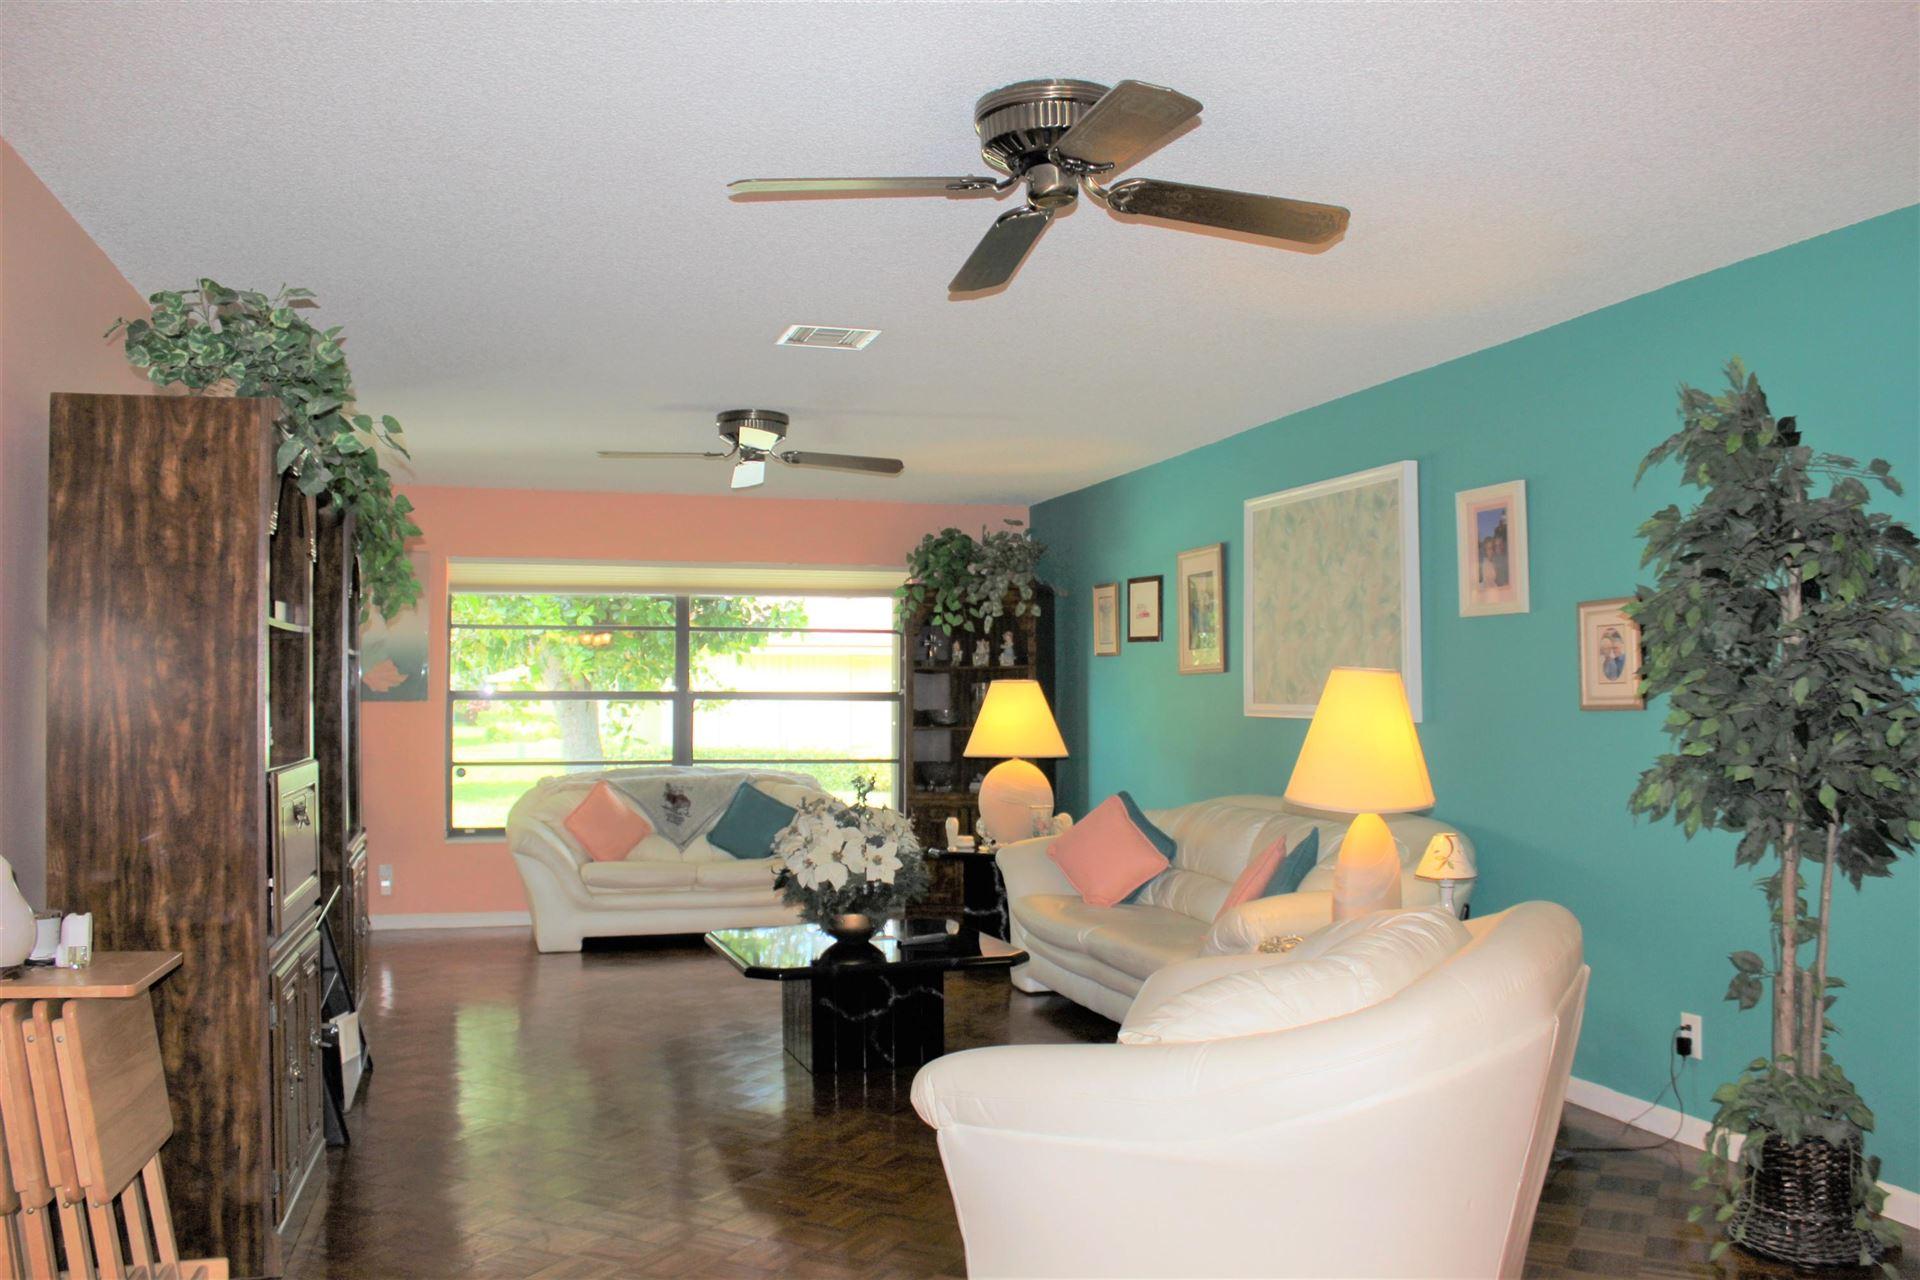 Photo of 9890 Cassia Tree Way #A, Boynton Beach, FL 33436 (MLS # RX-10623420)